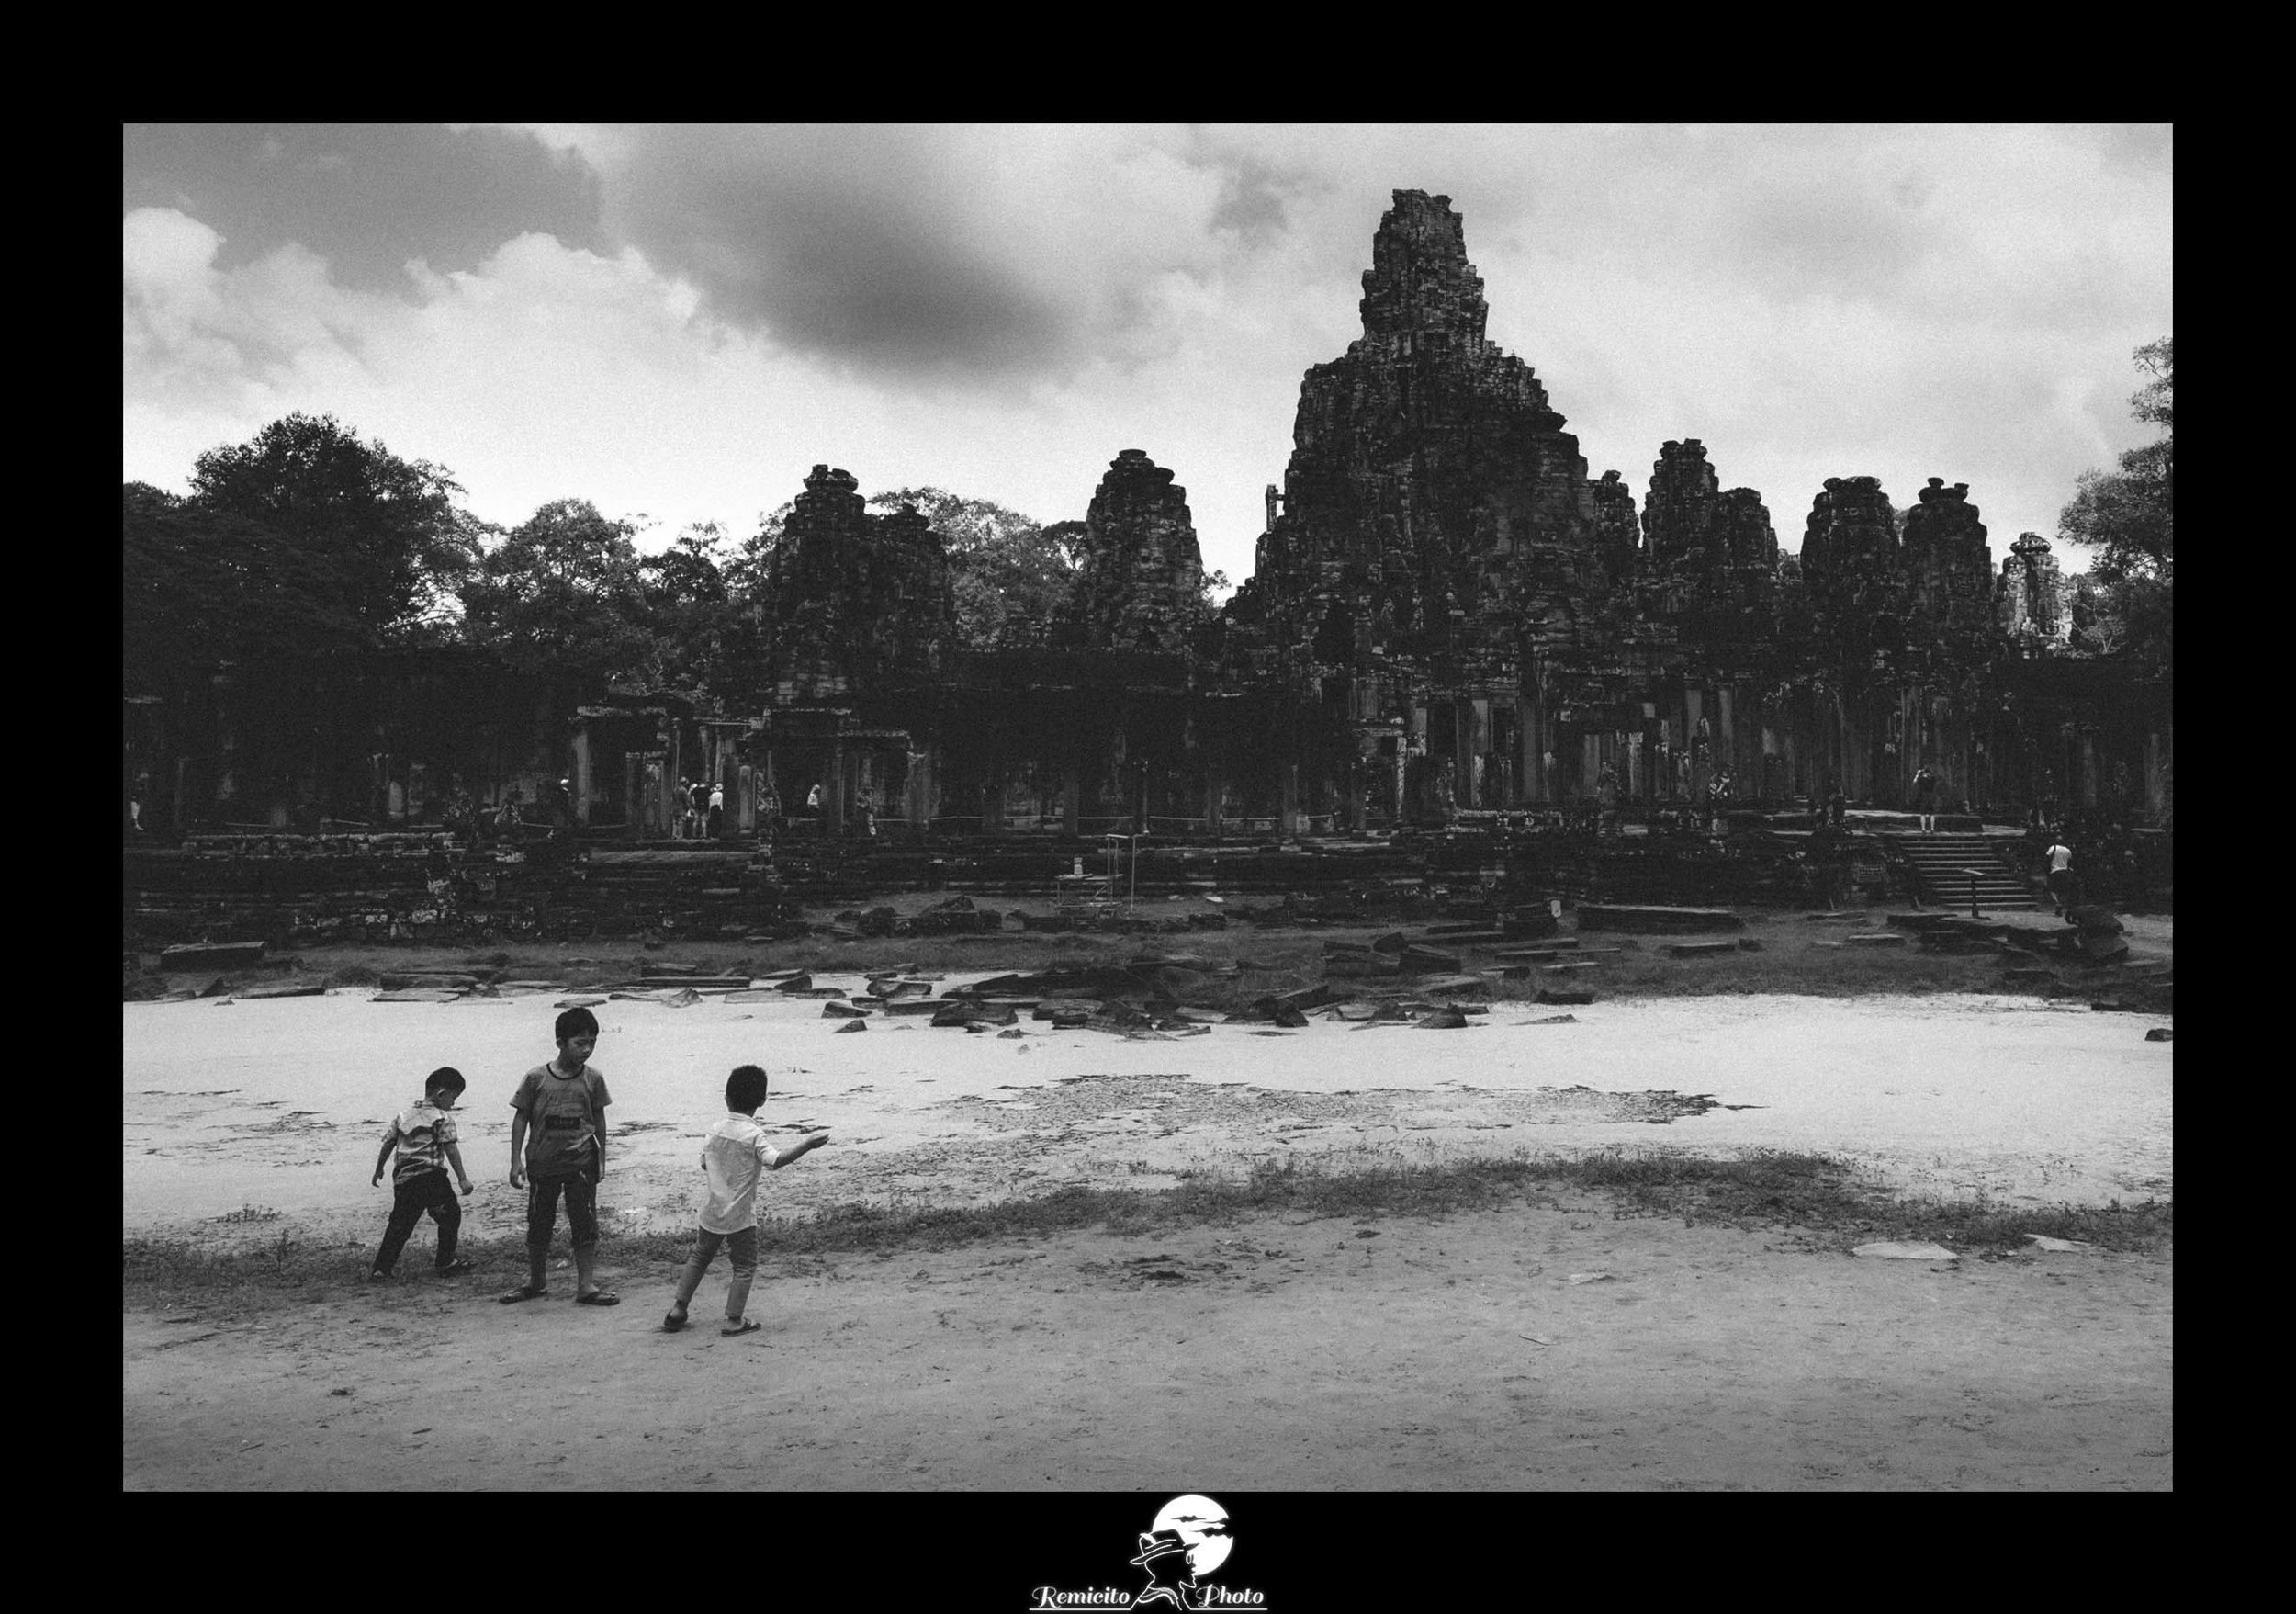 remicito photo, image du jour, photo du jour, photo of the day, black and white angkor, angkor temples, temples d'Angkor Cambodge, photo voyage cambodge, photo cambodge siam, photo enfants noir et blanc, idée cadeau, idée déco